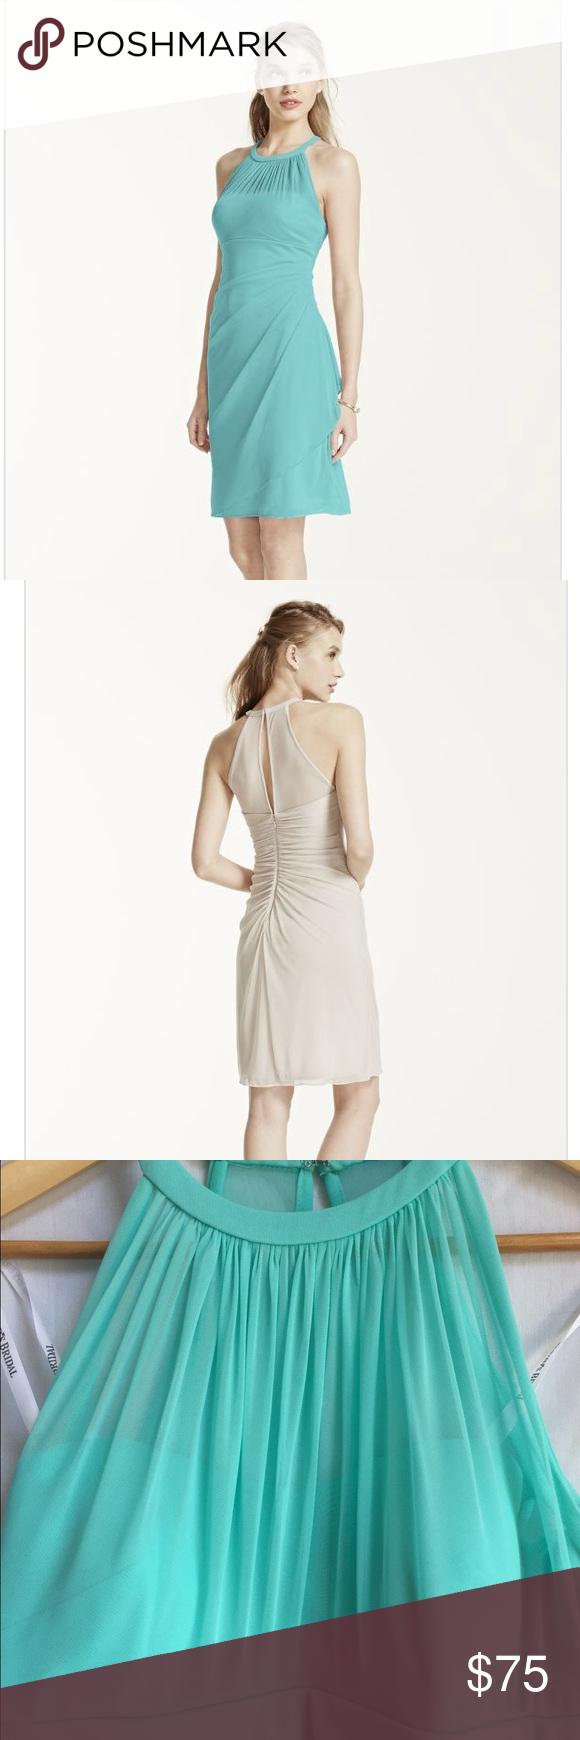 Sleeveless short mesh dress with side cascade bridesmaid dress